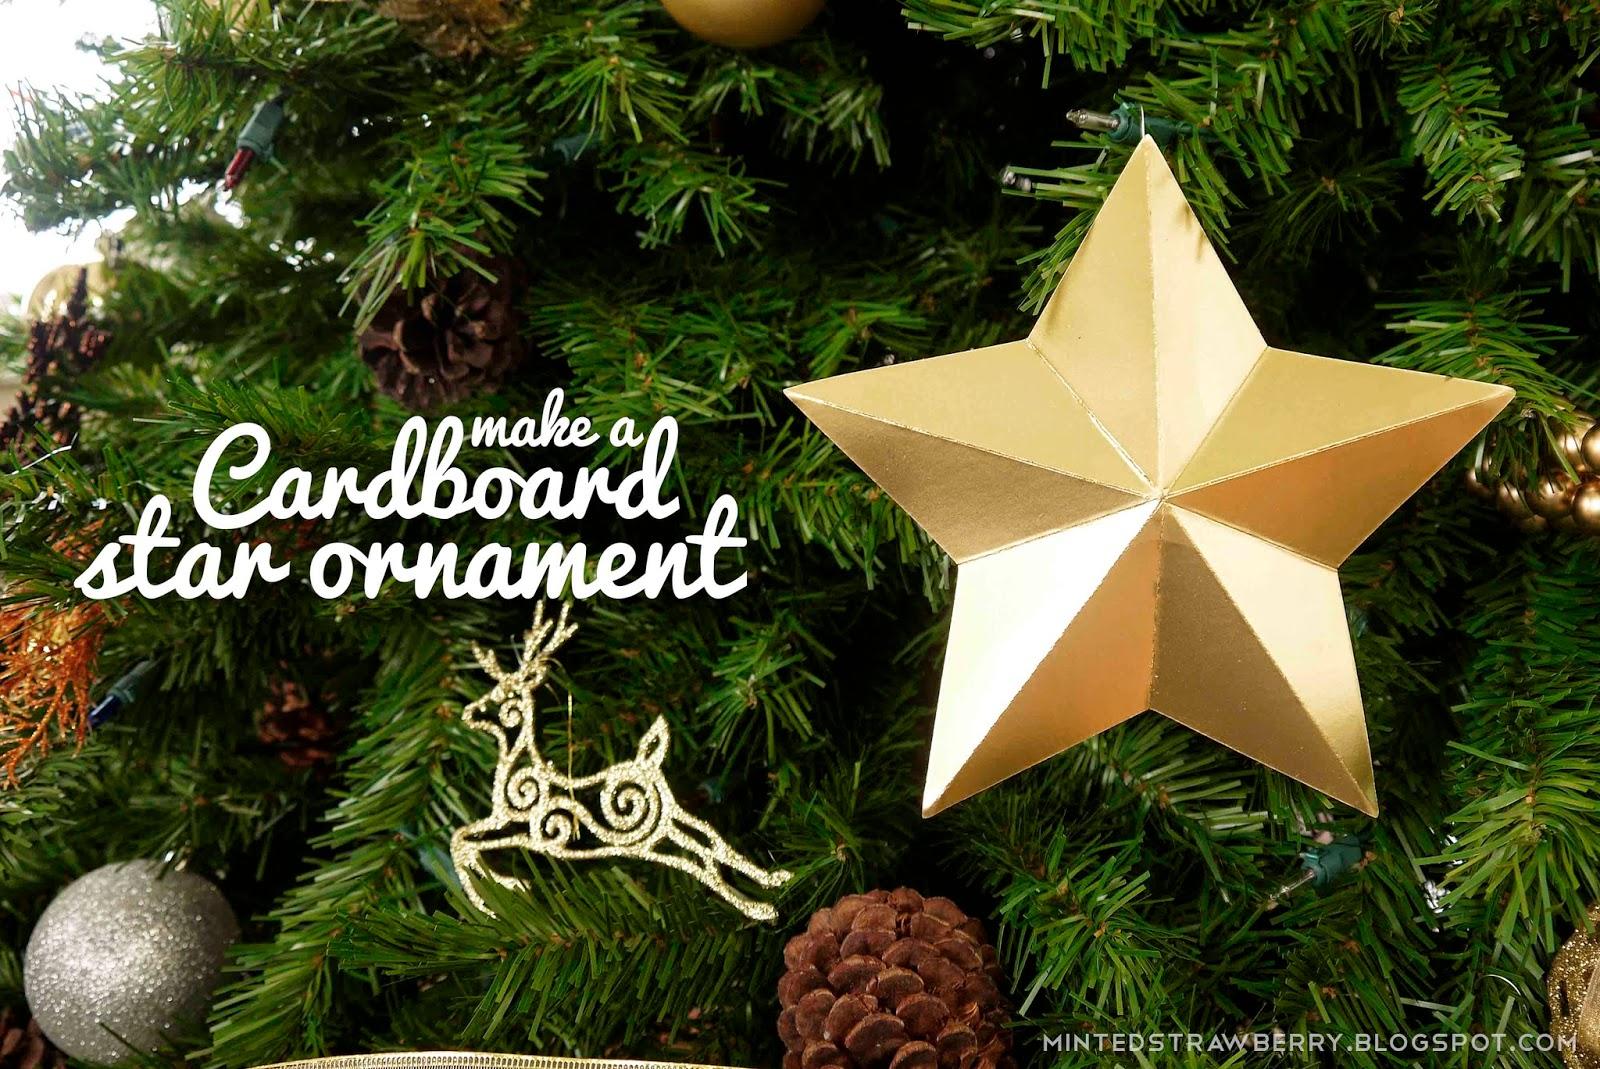 diy cardboard star ornaments tuesday november 12 i am the resident christmas